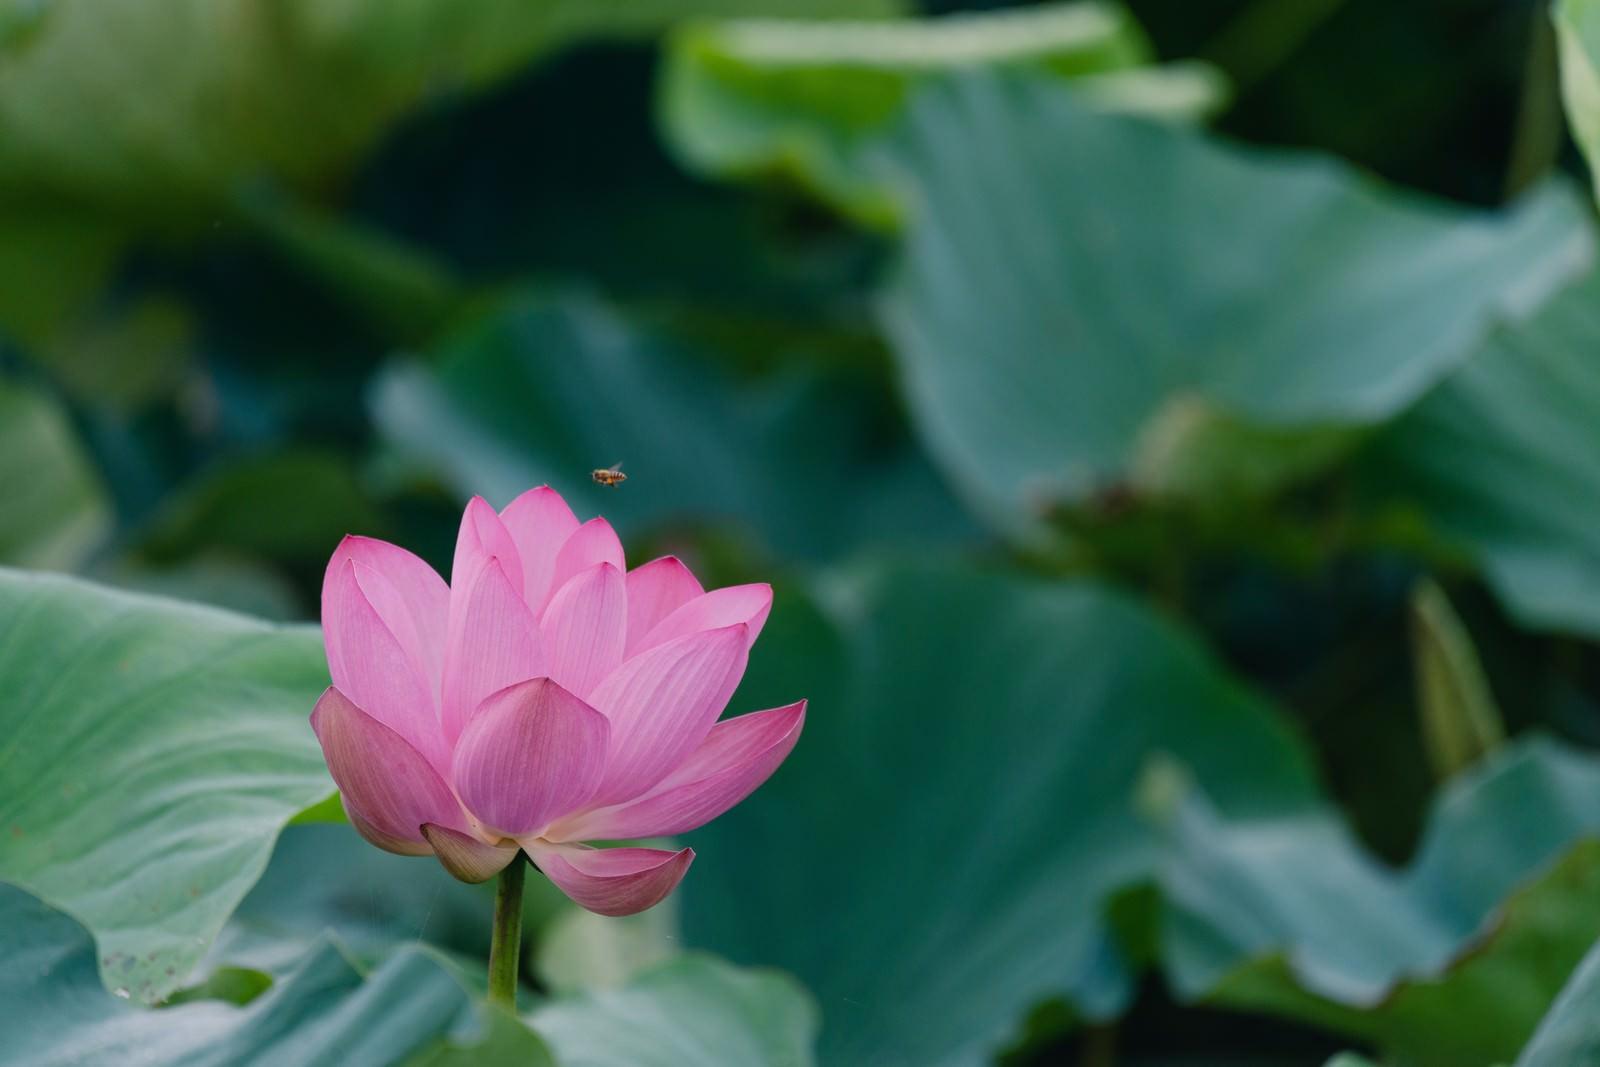 「一輪の蓮と蜂(埼玉県川越市伊佐沼)」の写真